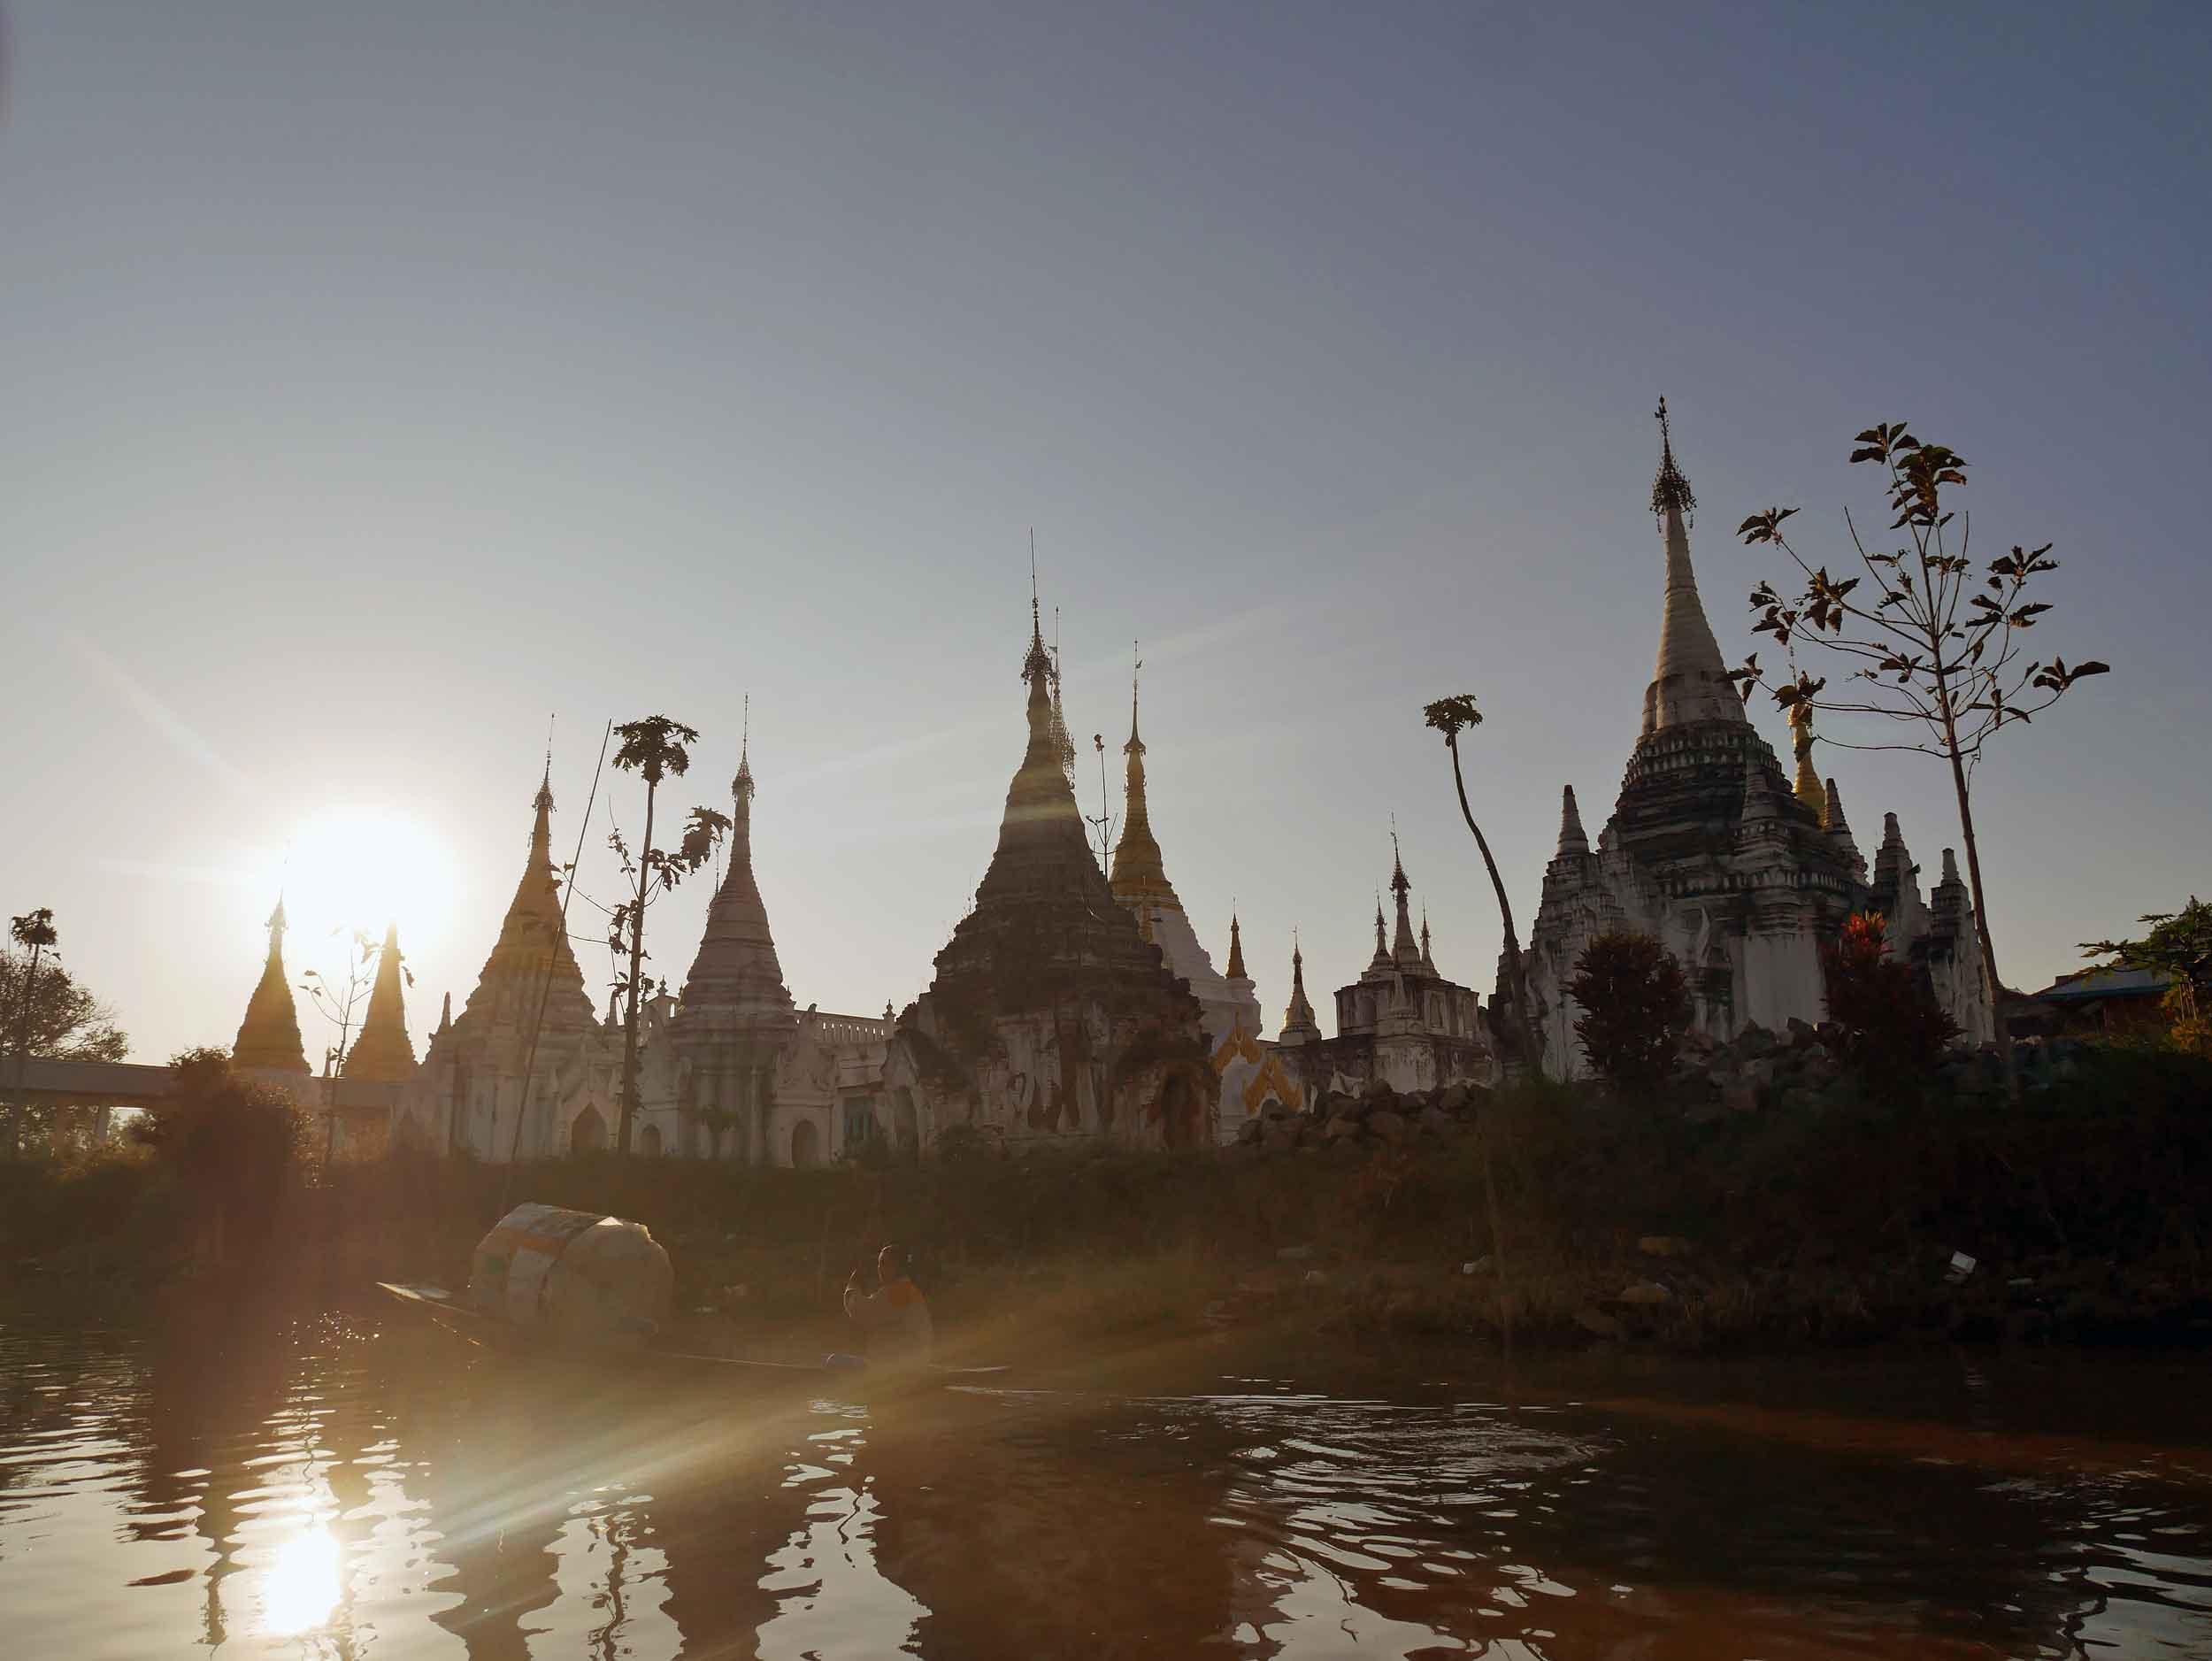 A glittering temple along the lake's edge (Feb 22).